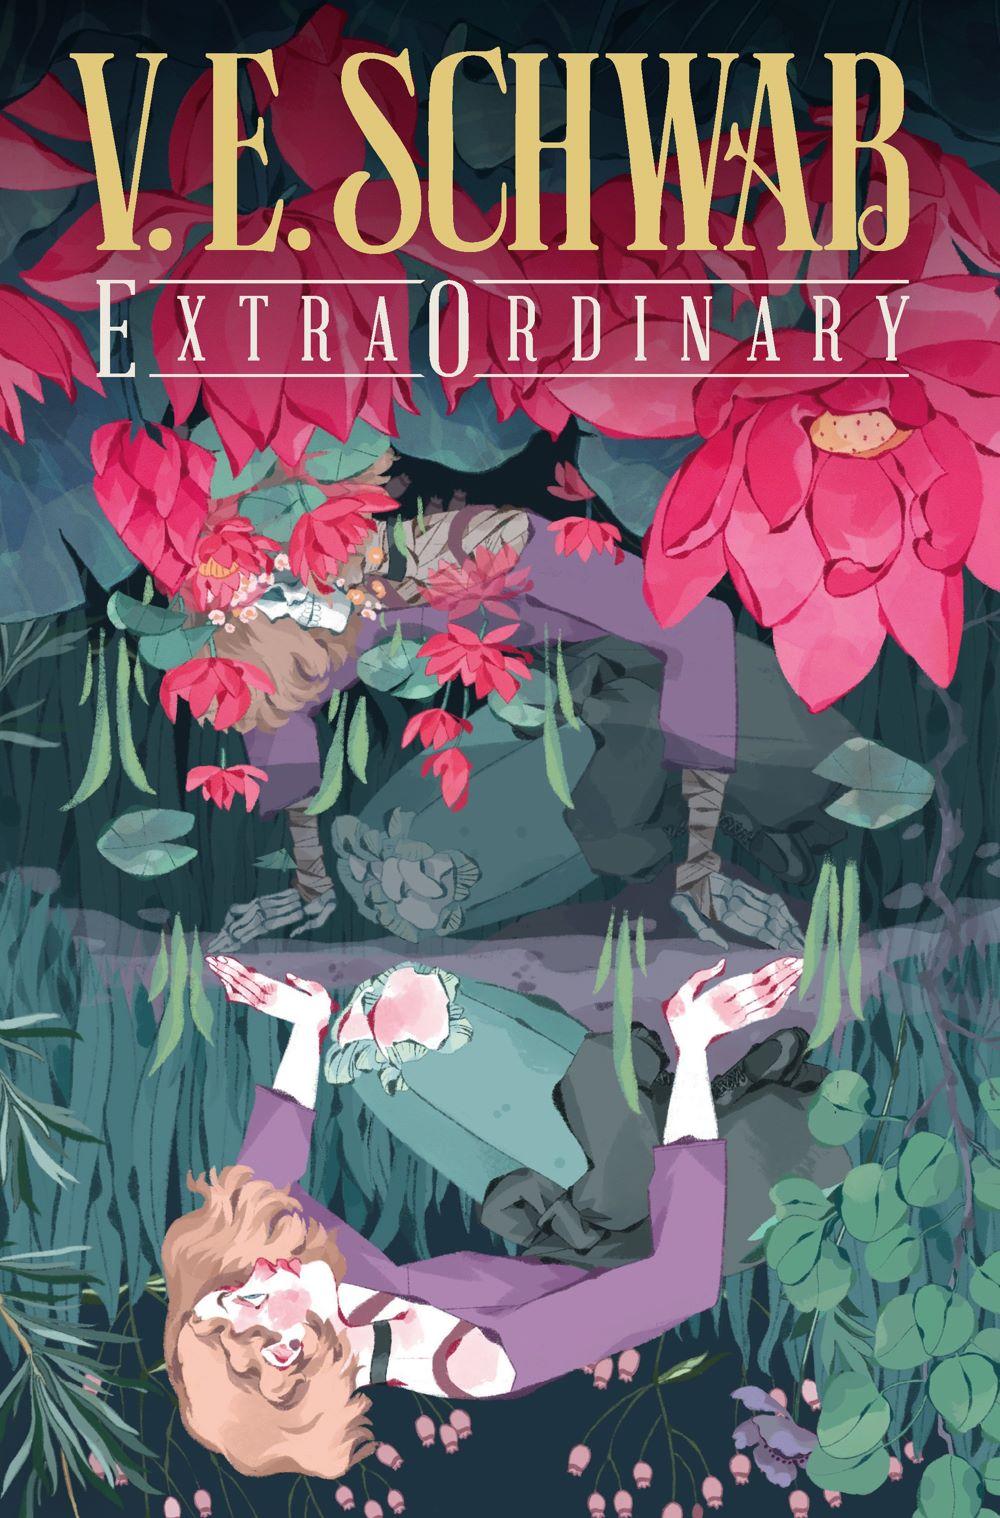 ExtraOrdinary-3B-Mancini Titan Comics August 2021 Solicitations